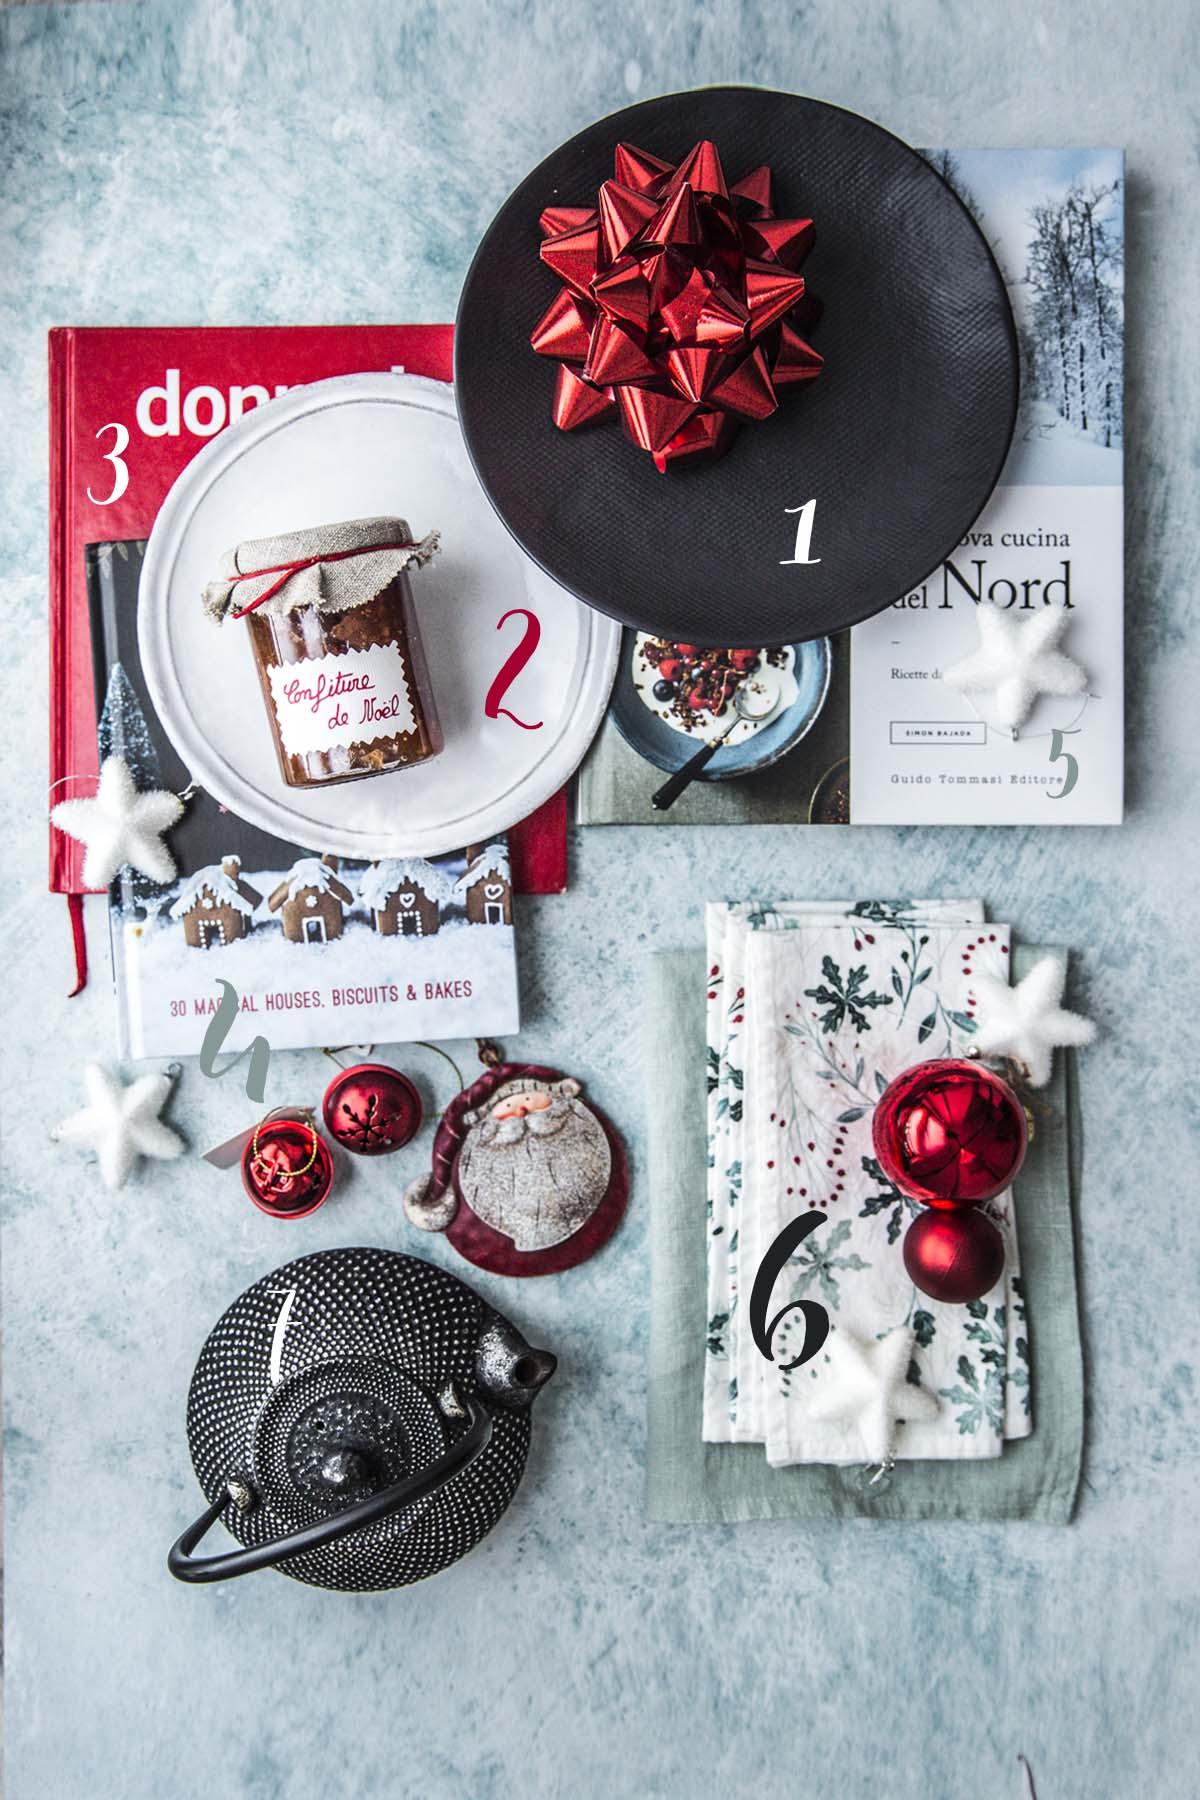 Regali di Natale